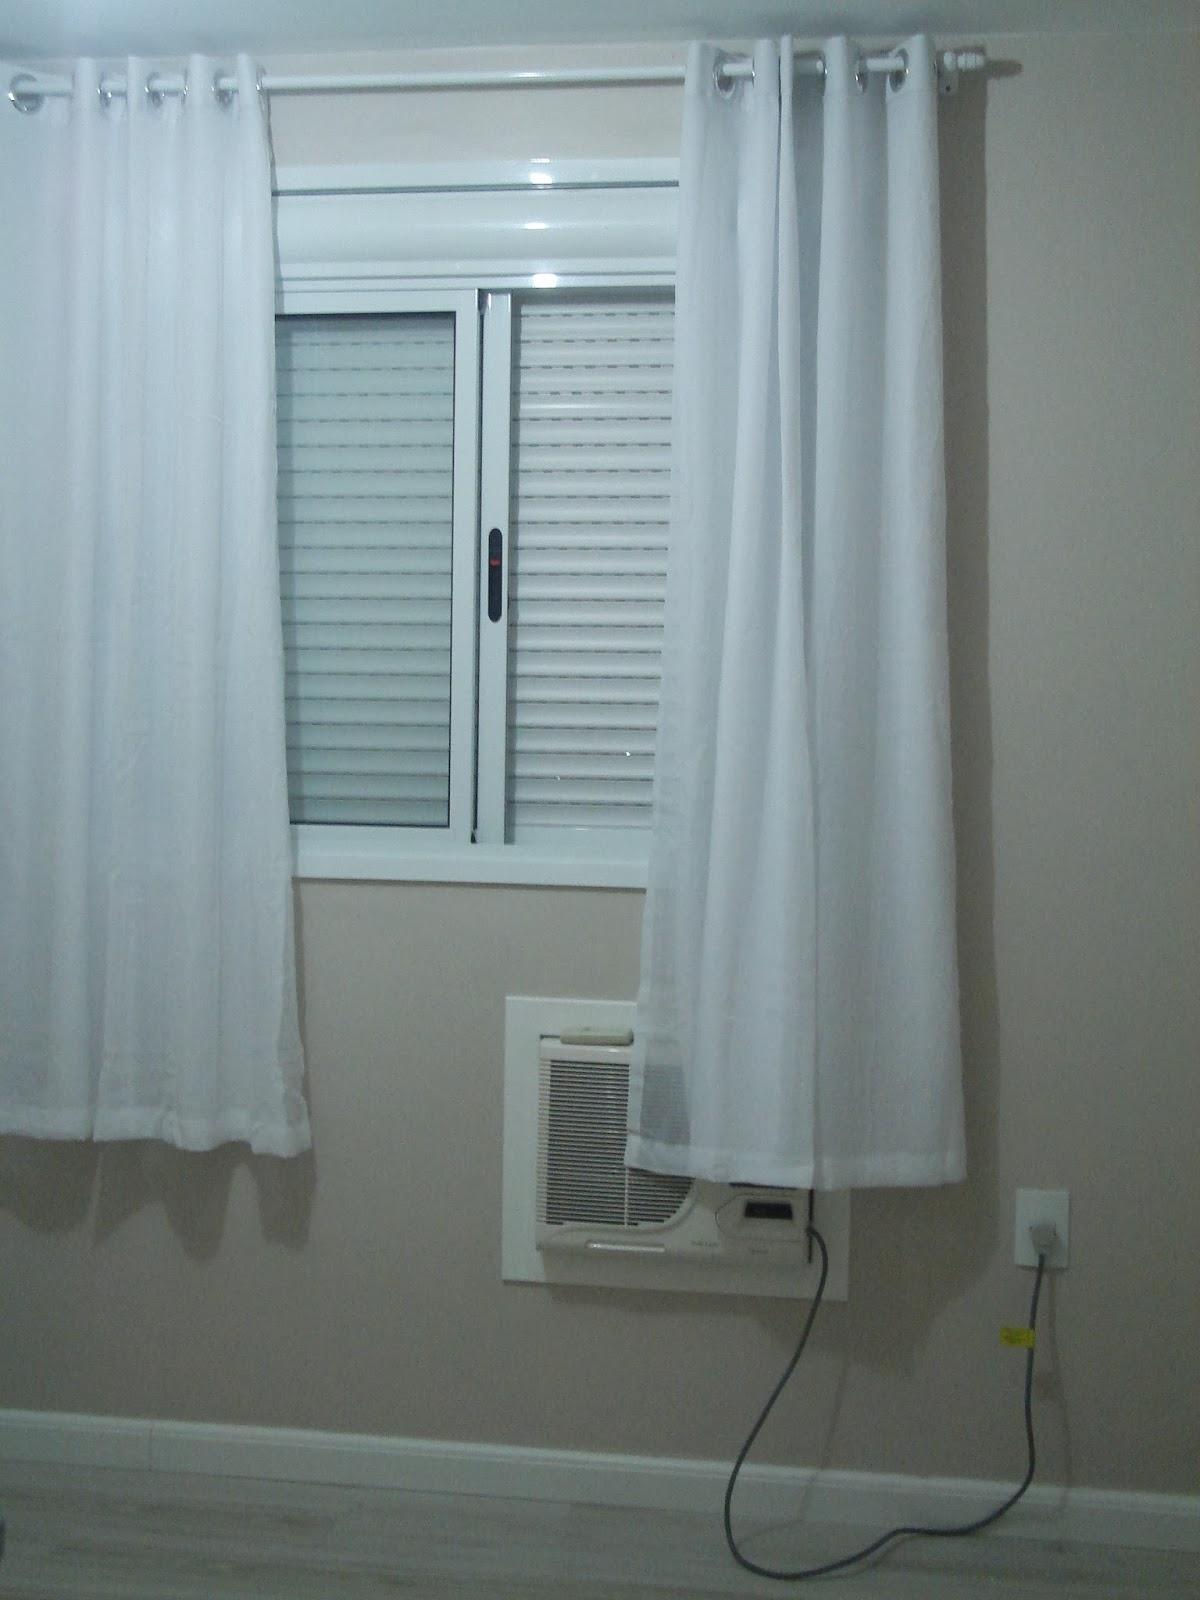 Casei, quero casa Cortina no quarto